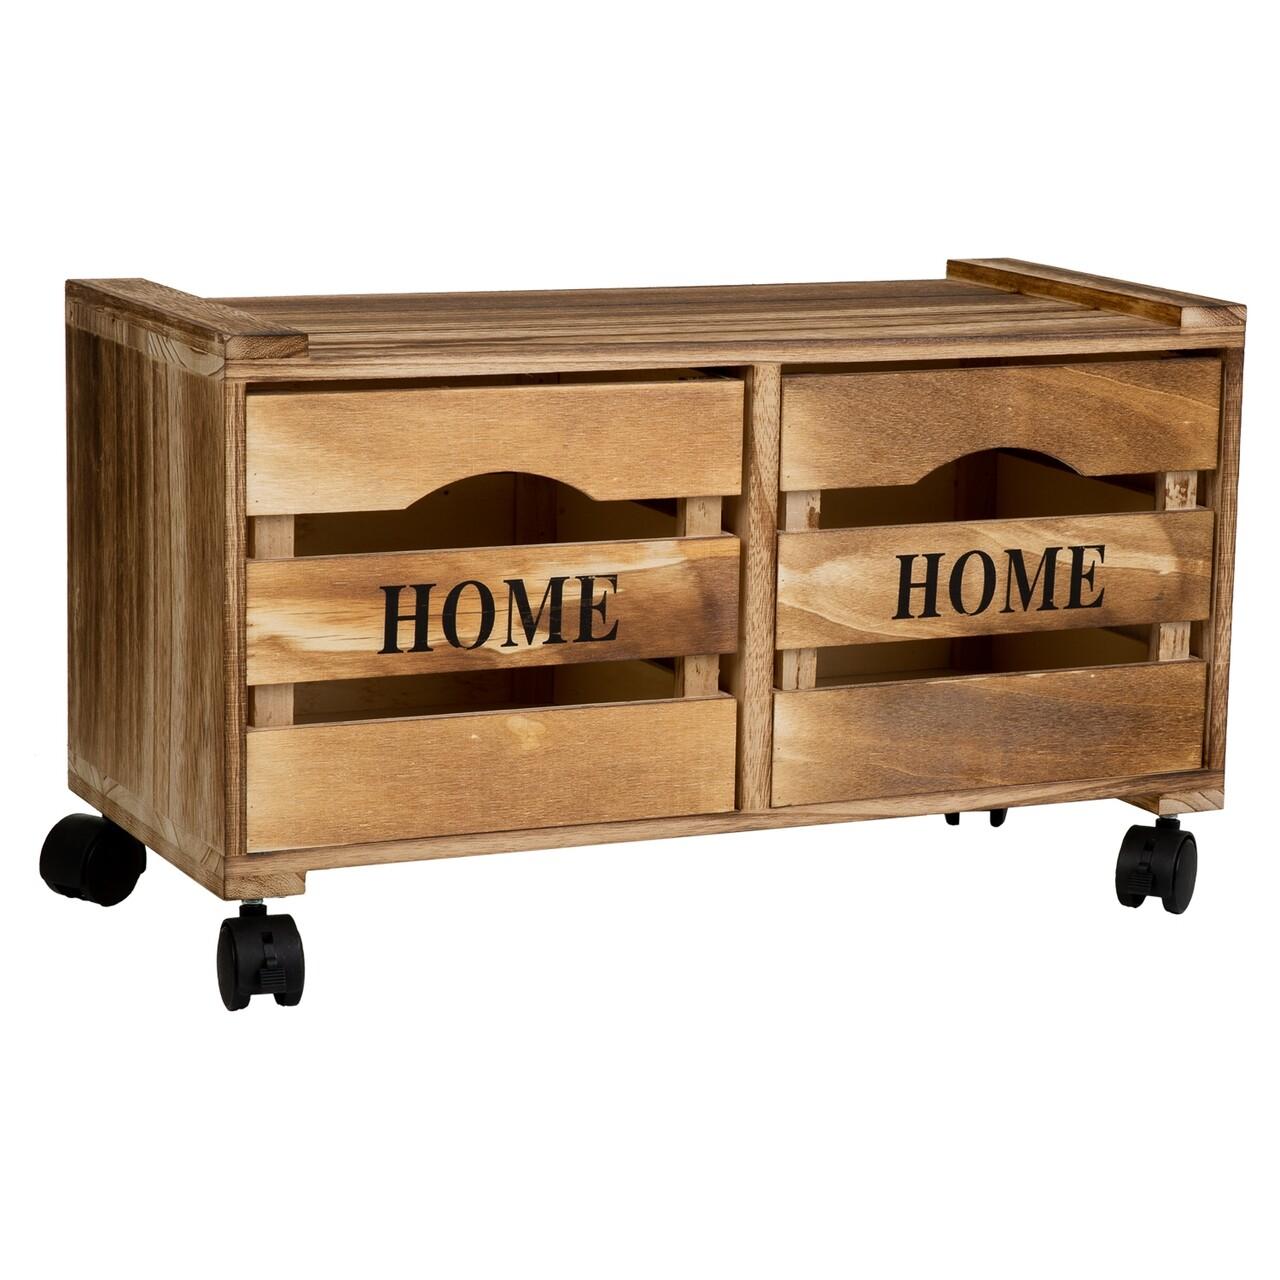 Comoda cu 2 sertare si roti Home, Creaciones Meng, 55x25x31.5 cm, lemn de paulownia/MDF